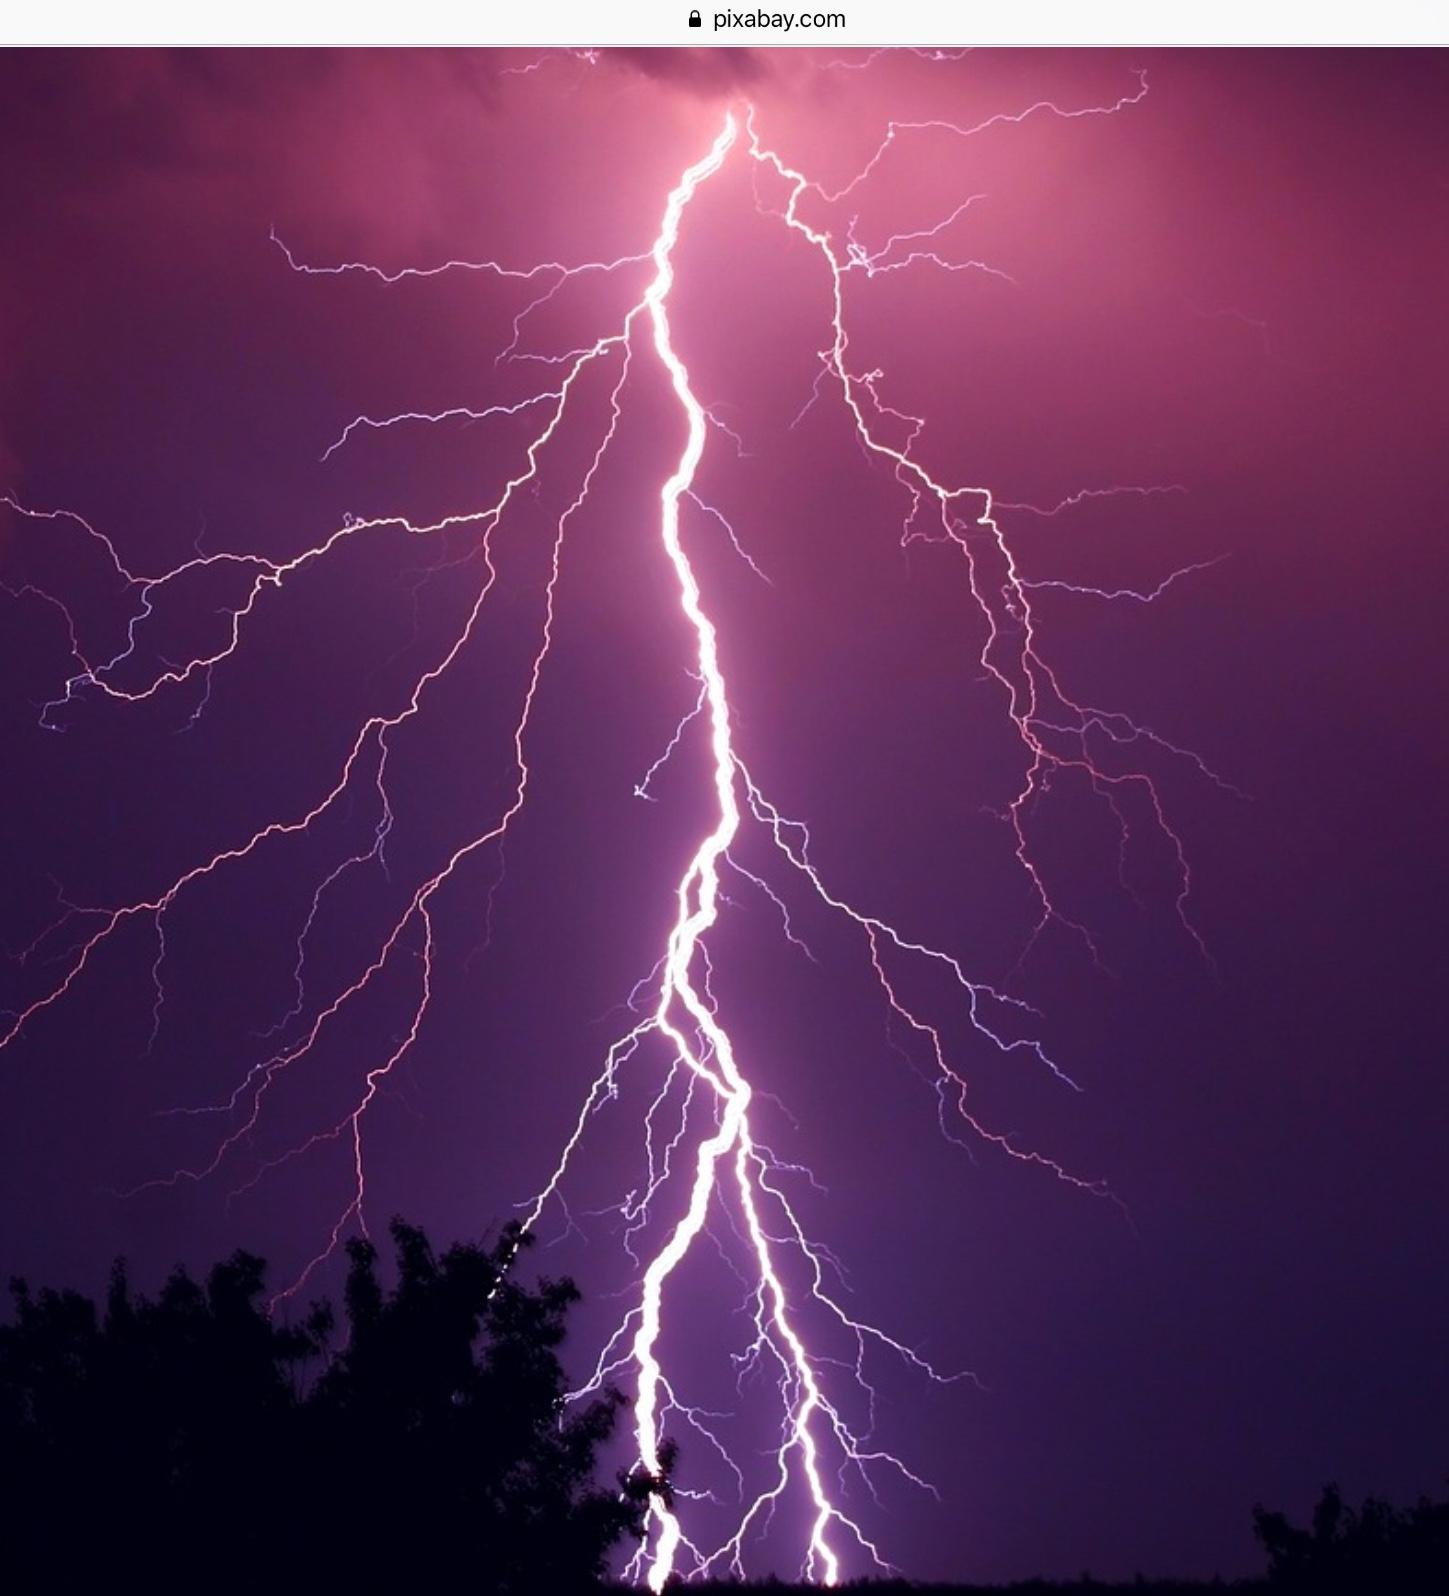 technical tips to avoid lightning damage